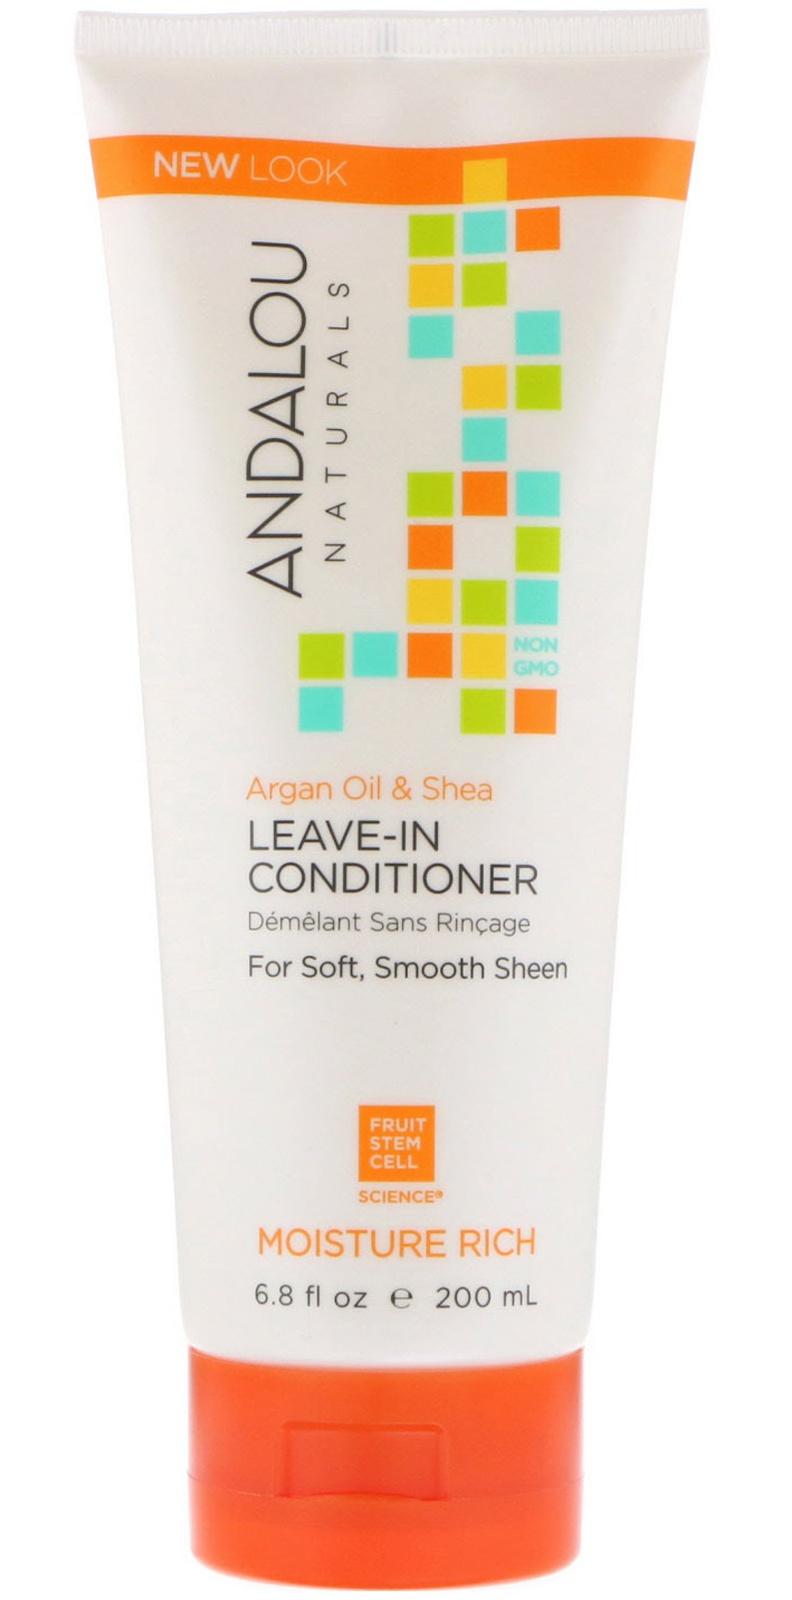 Andalou Naturals Moisture Rich Argan Oil & Shea Leave-In Conditioner